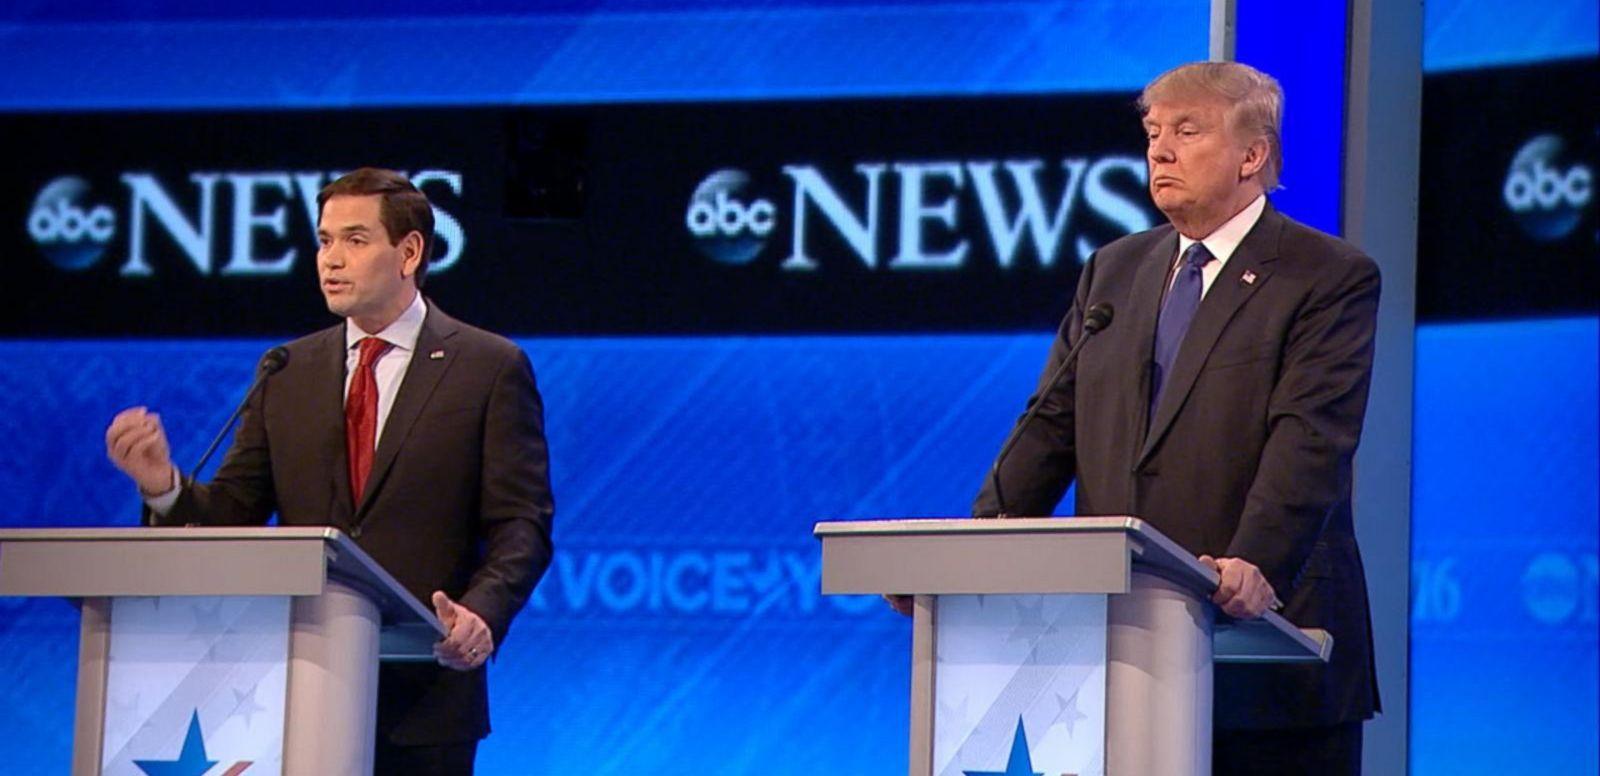 VIDEO: GOP Candidates Debate North Korea's Nuclear Threat